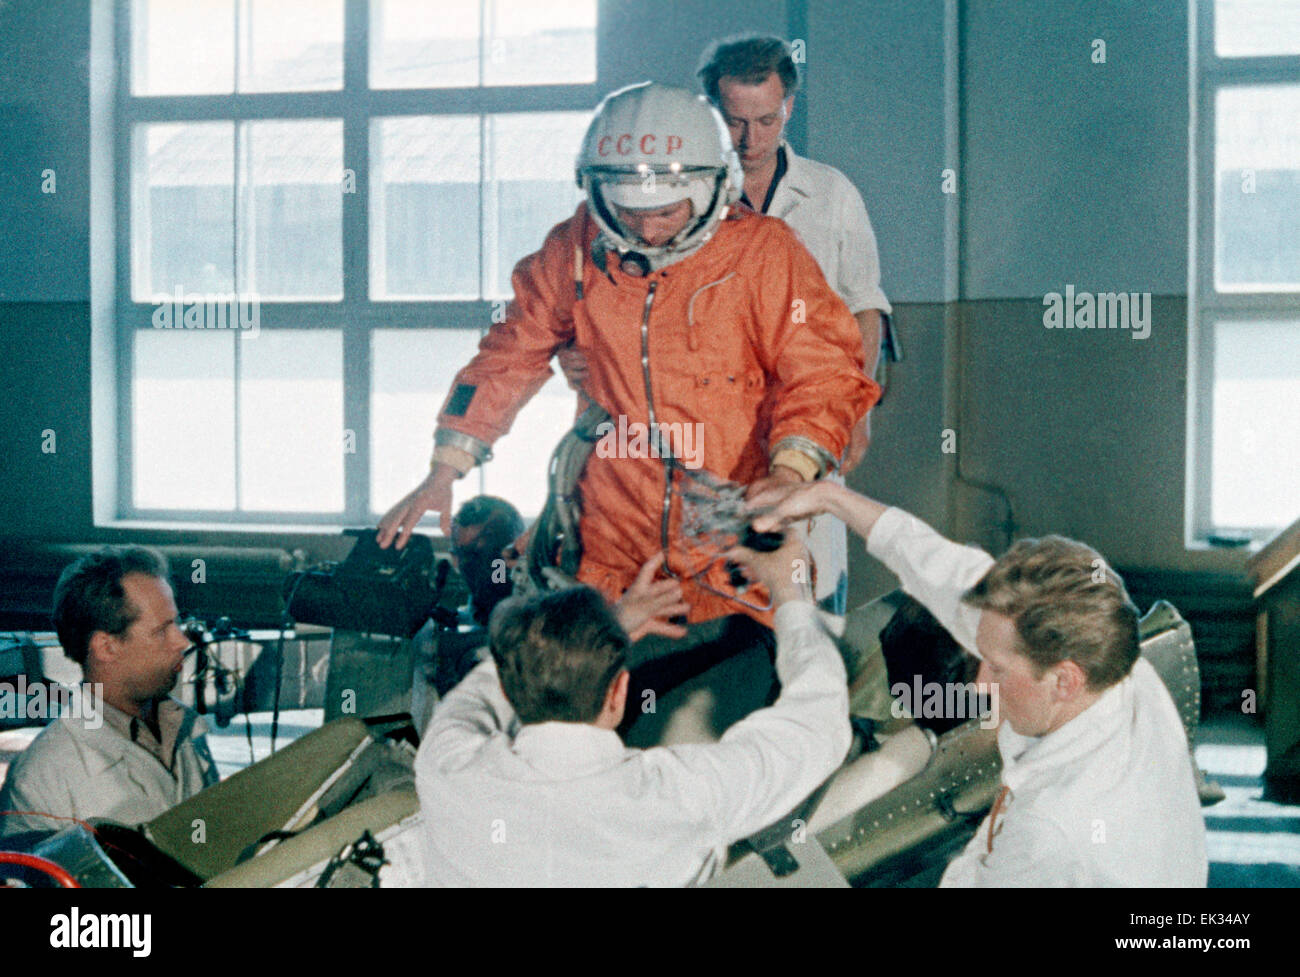 Baikonur Cosmodrome. Kazakh SSR. USSR. Preparation of first cosmonaut Yuri Gagarin to the space flight. - Stock Image